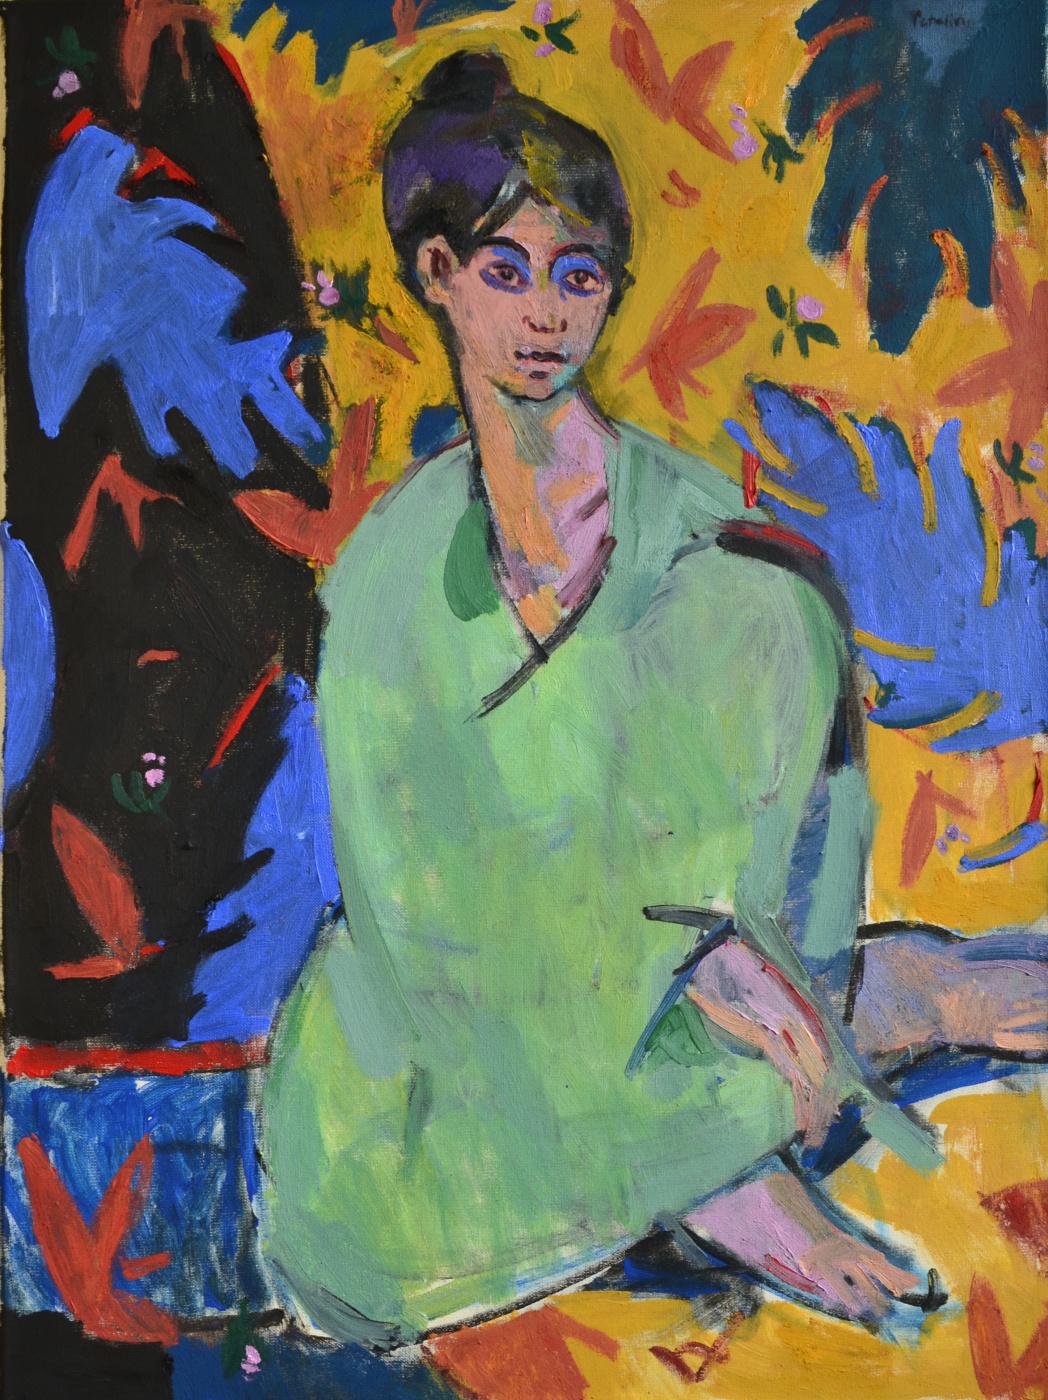 Alexandr Petelin. She